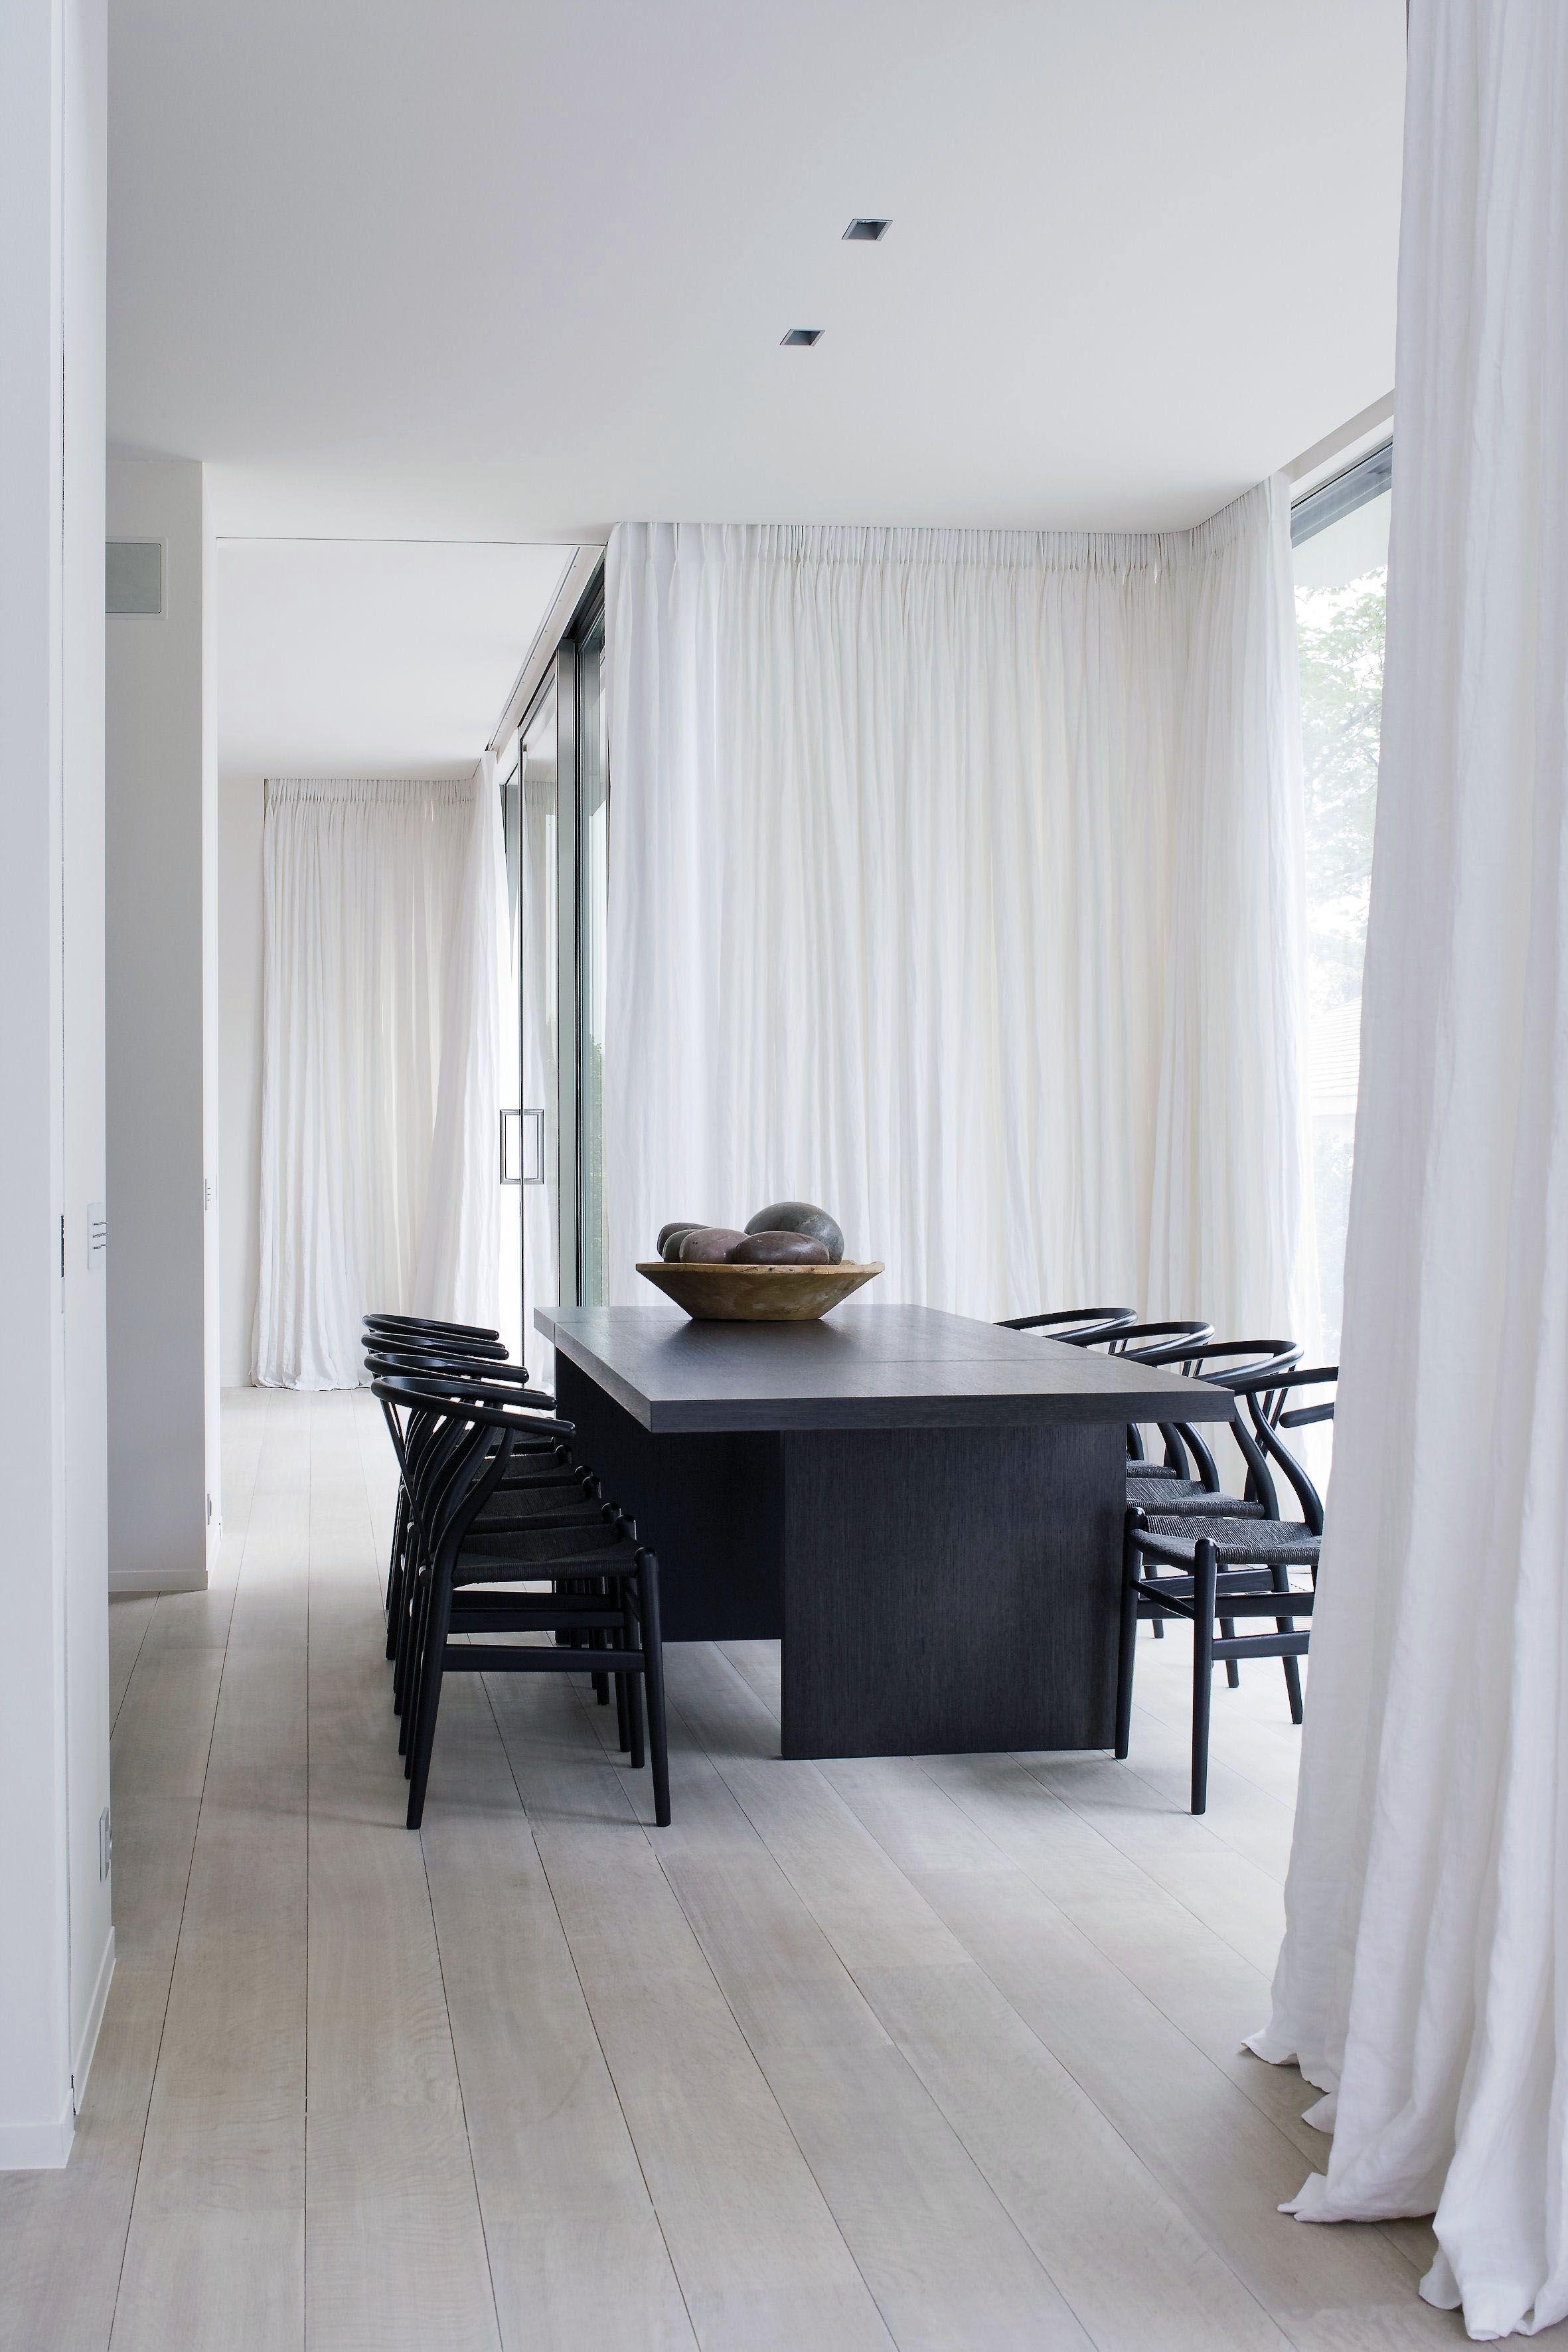 Inspiring Shower Curtains Menards Just On Arendecor Com Interior